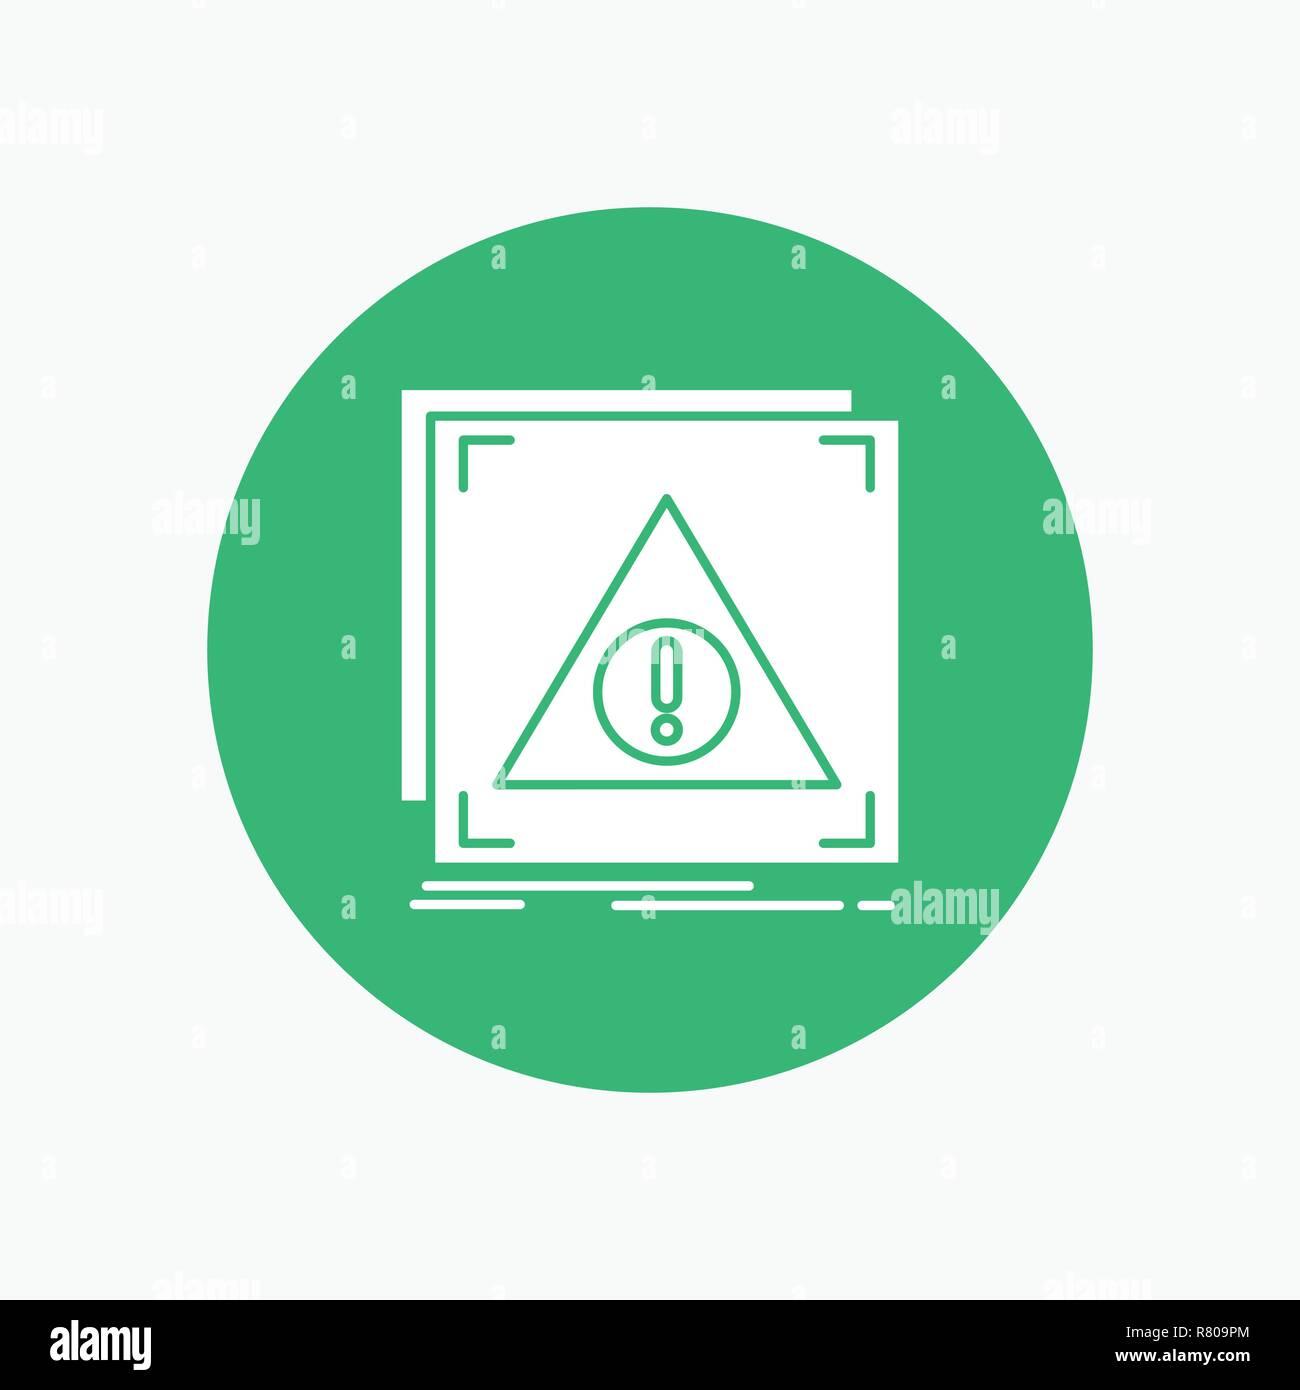 Error, Application, Denied, server, alert White Glyph Icon in Circle. Vector Button illustration - Stock Image